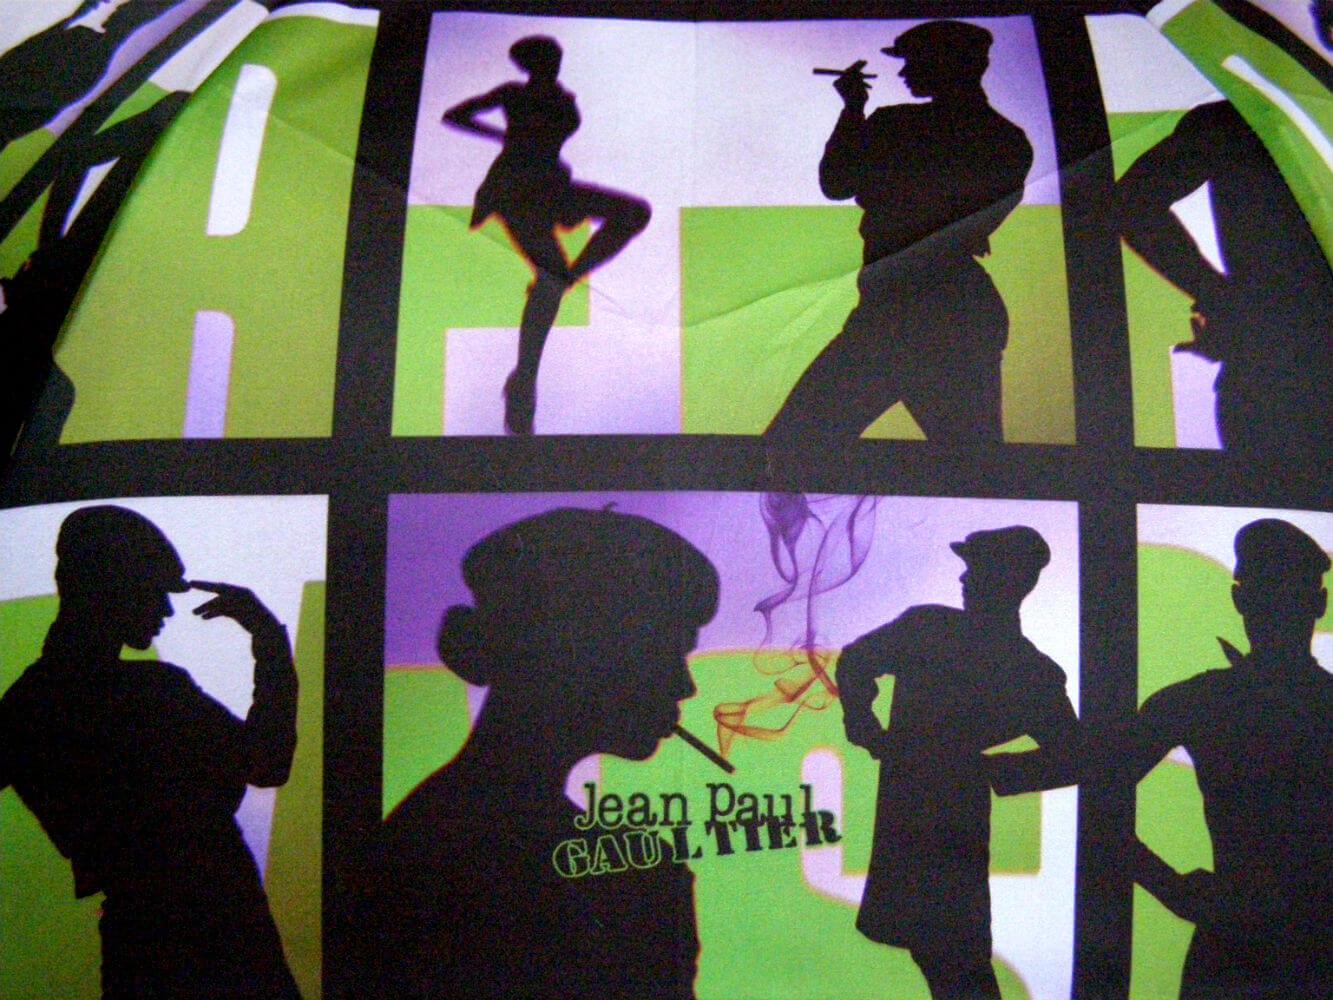 Зонт складной JP Gaultier 1171-3 Silhouette